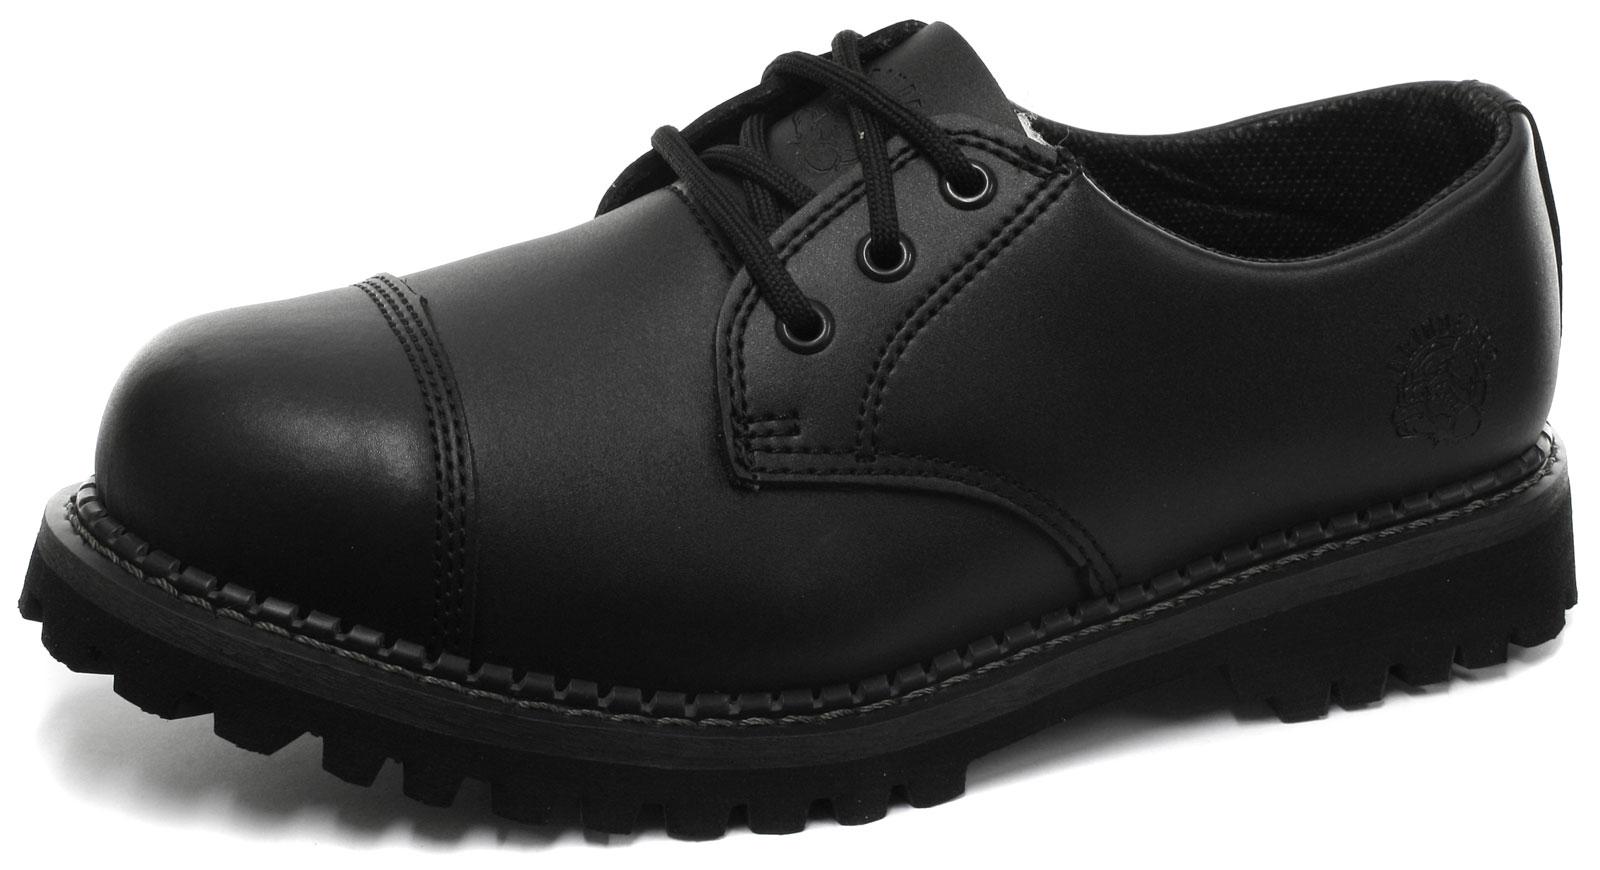 Grinders New Regent Shoes